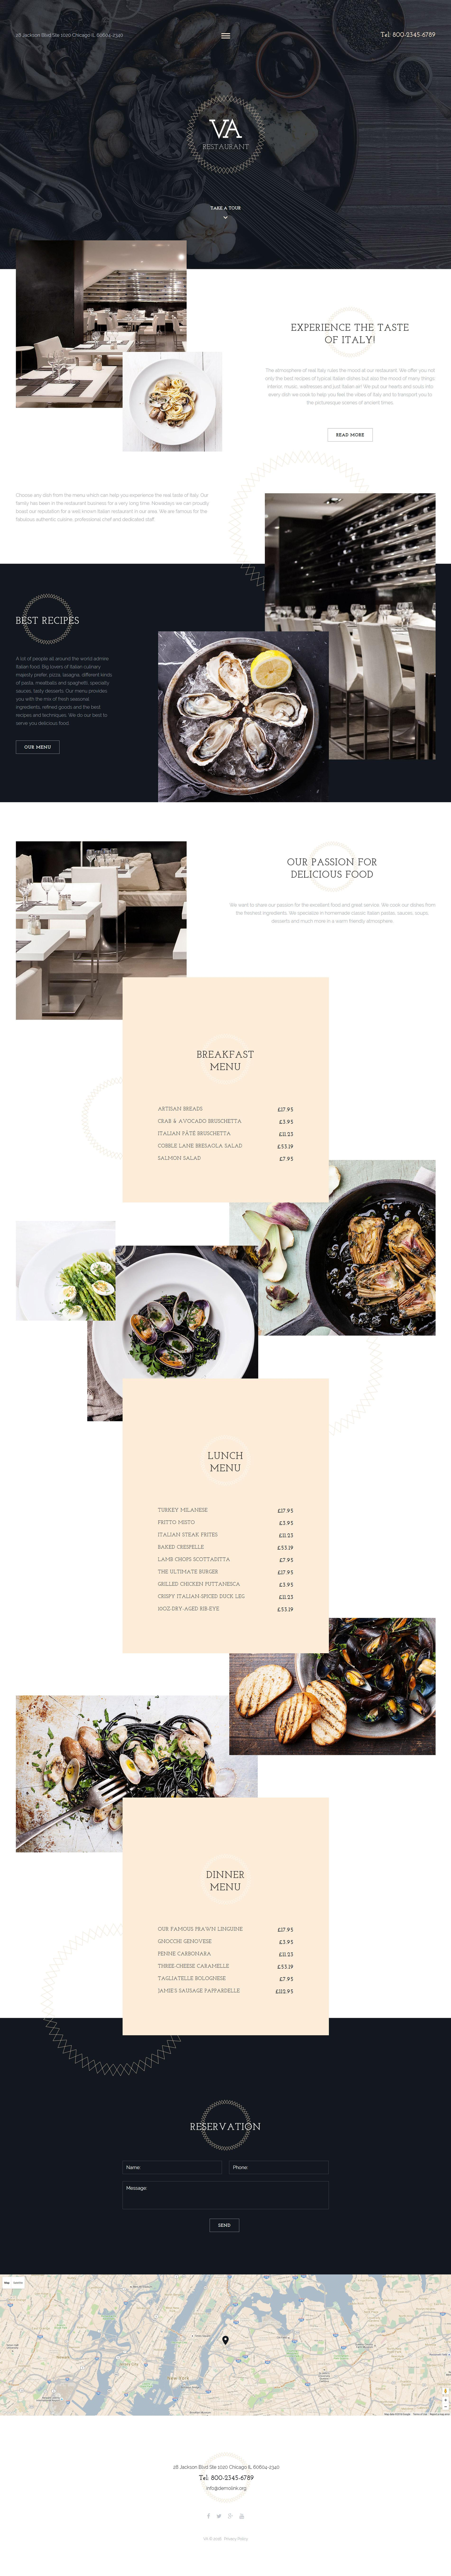 """VA Restaurant"" 响应式Joomla模板 #57781"